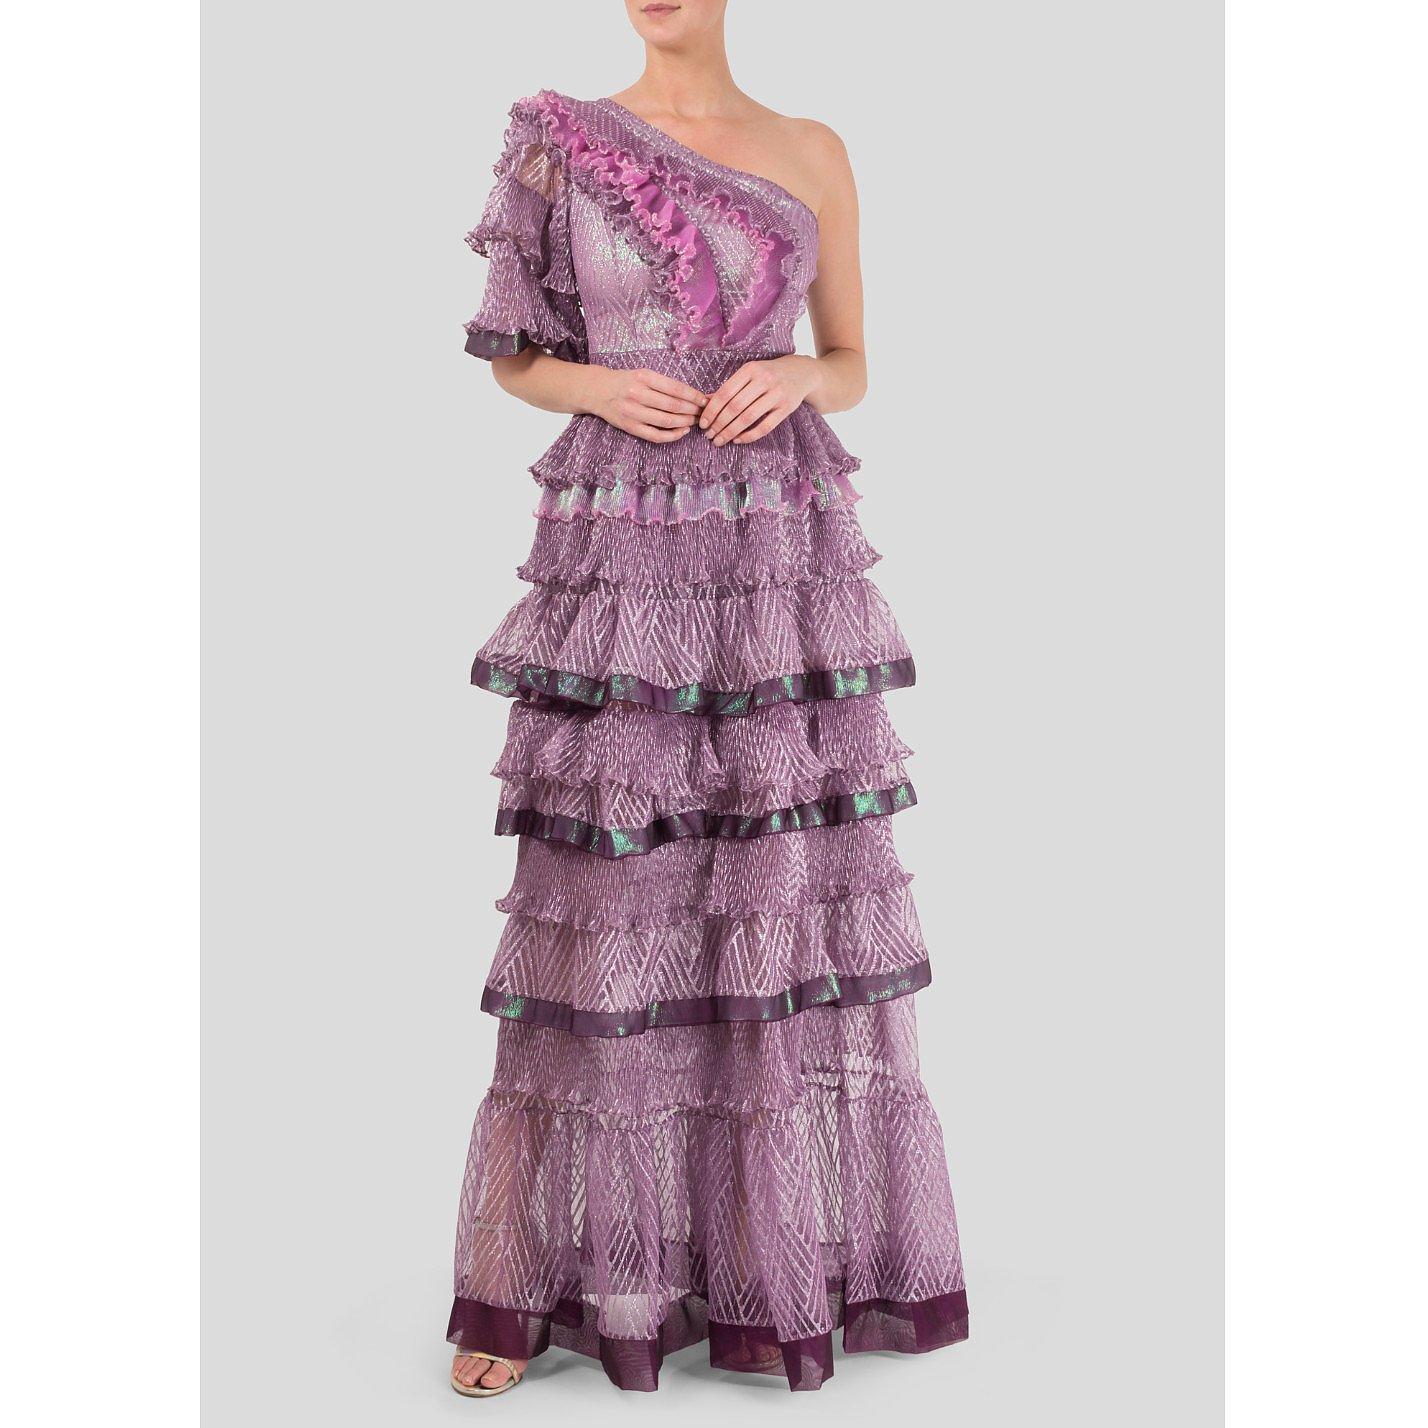 Bora Aksu One Shoulder Tiered Ruffle Gown